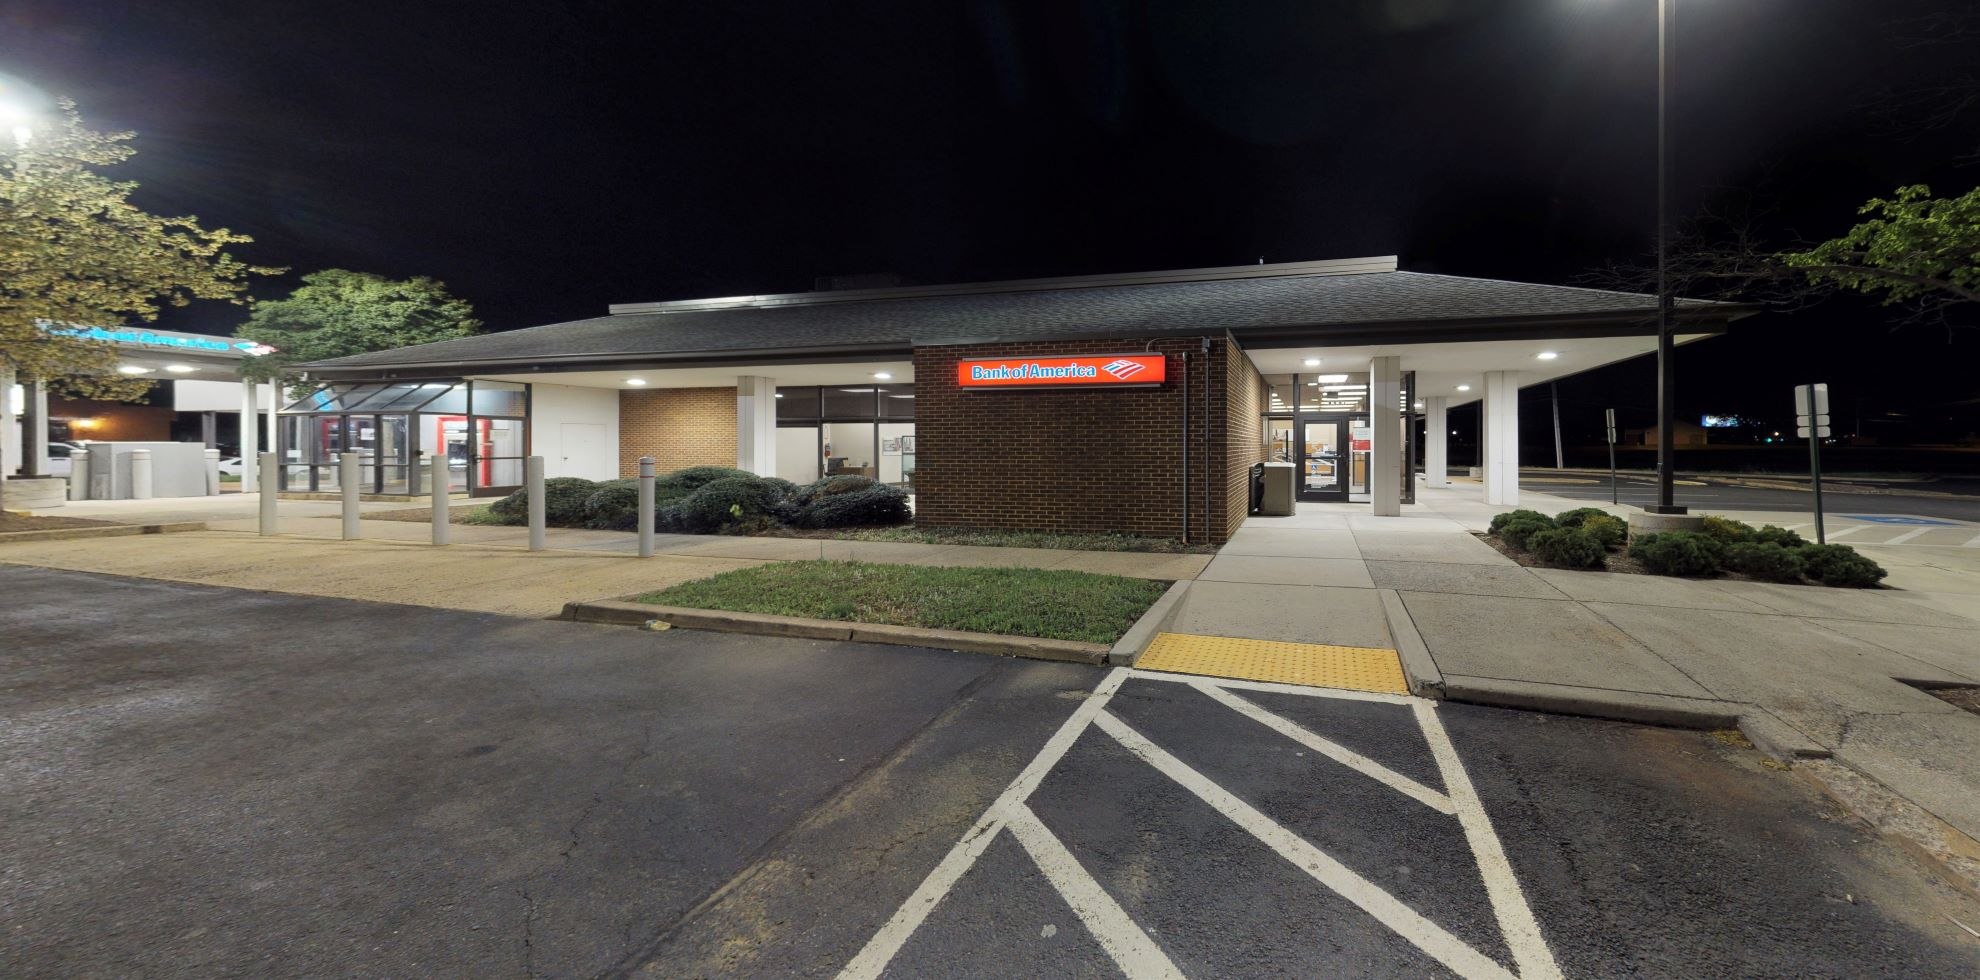 Bank of America financial center with drive-thru ATM | 8501 Sudley Rd, Manassas, VA 20109